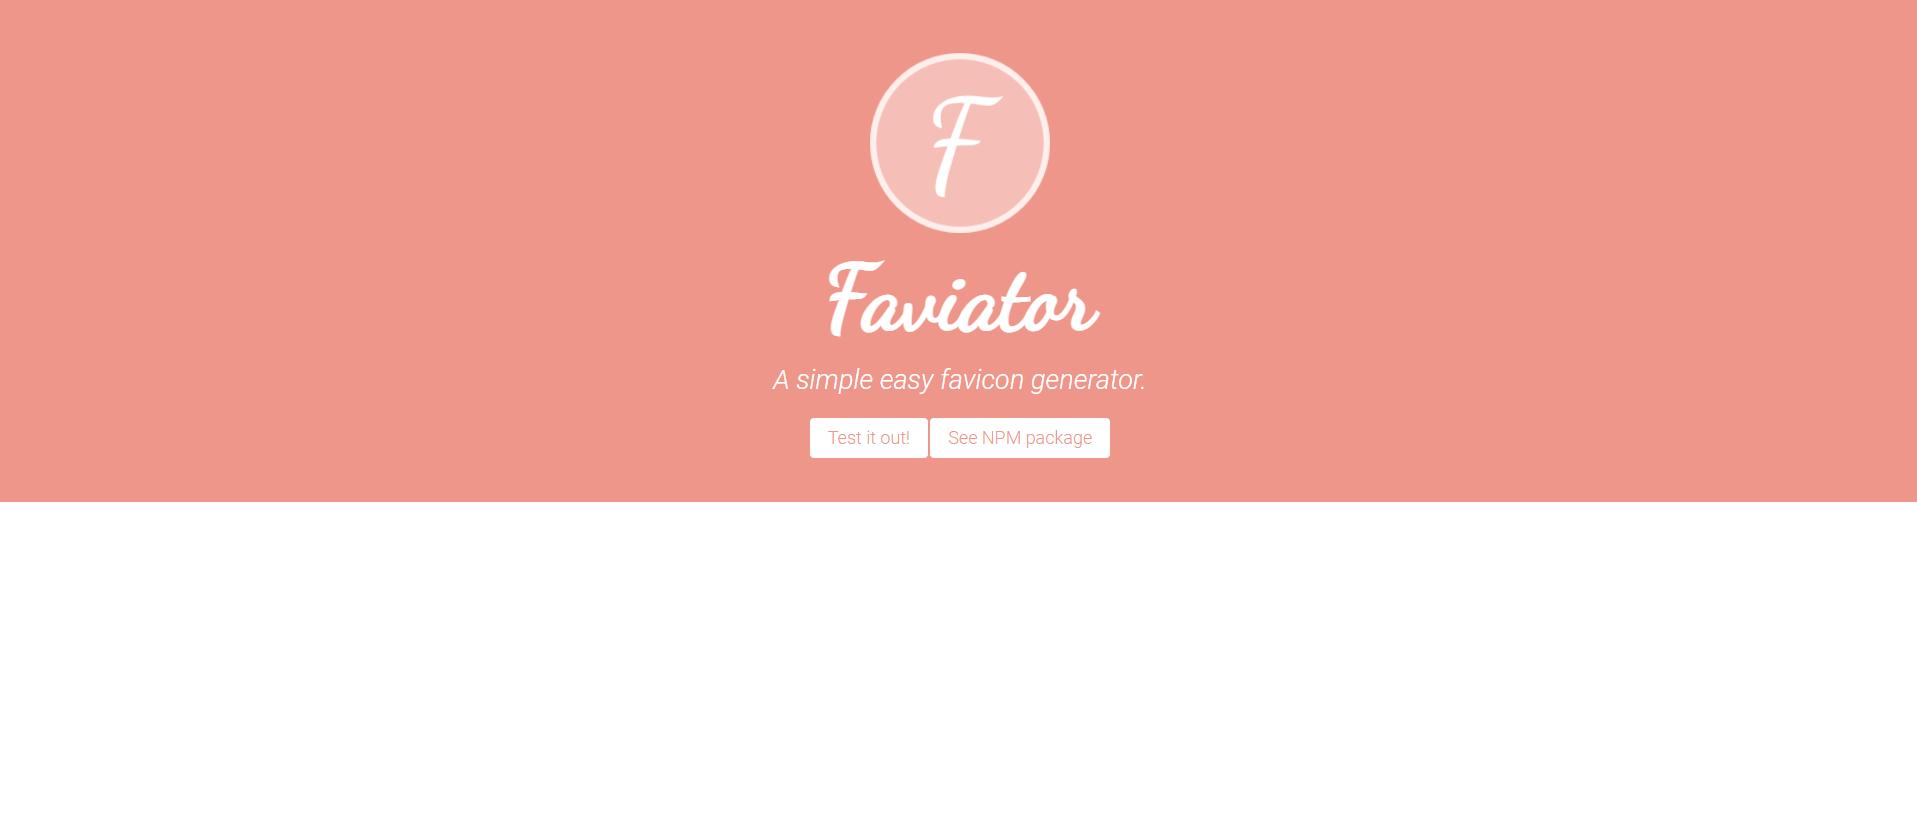 Faviator vuejs project